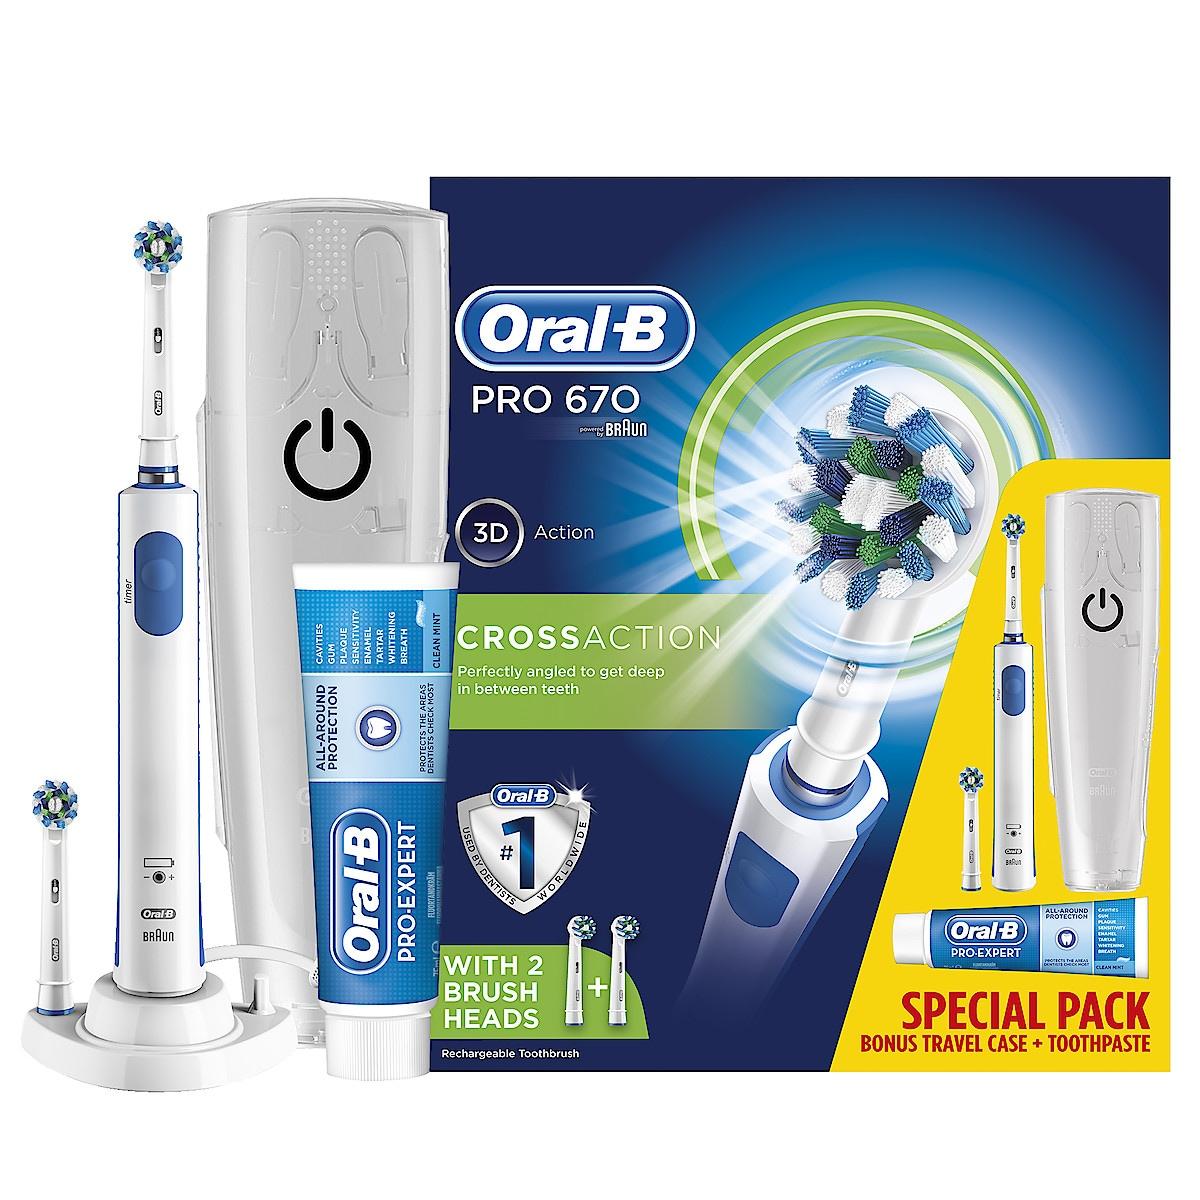 Sähköhammasharja Braun Oral-B PRO 670 Special pack